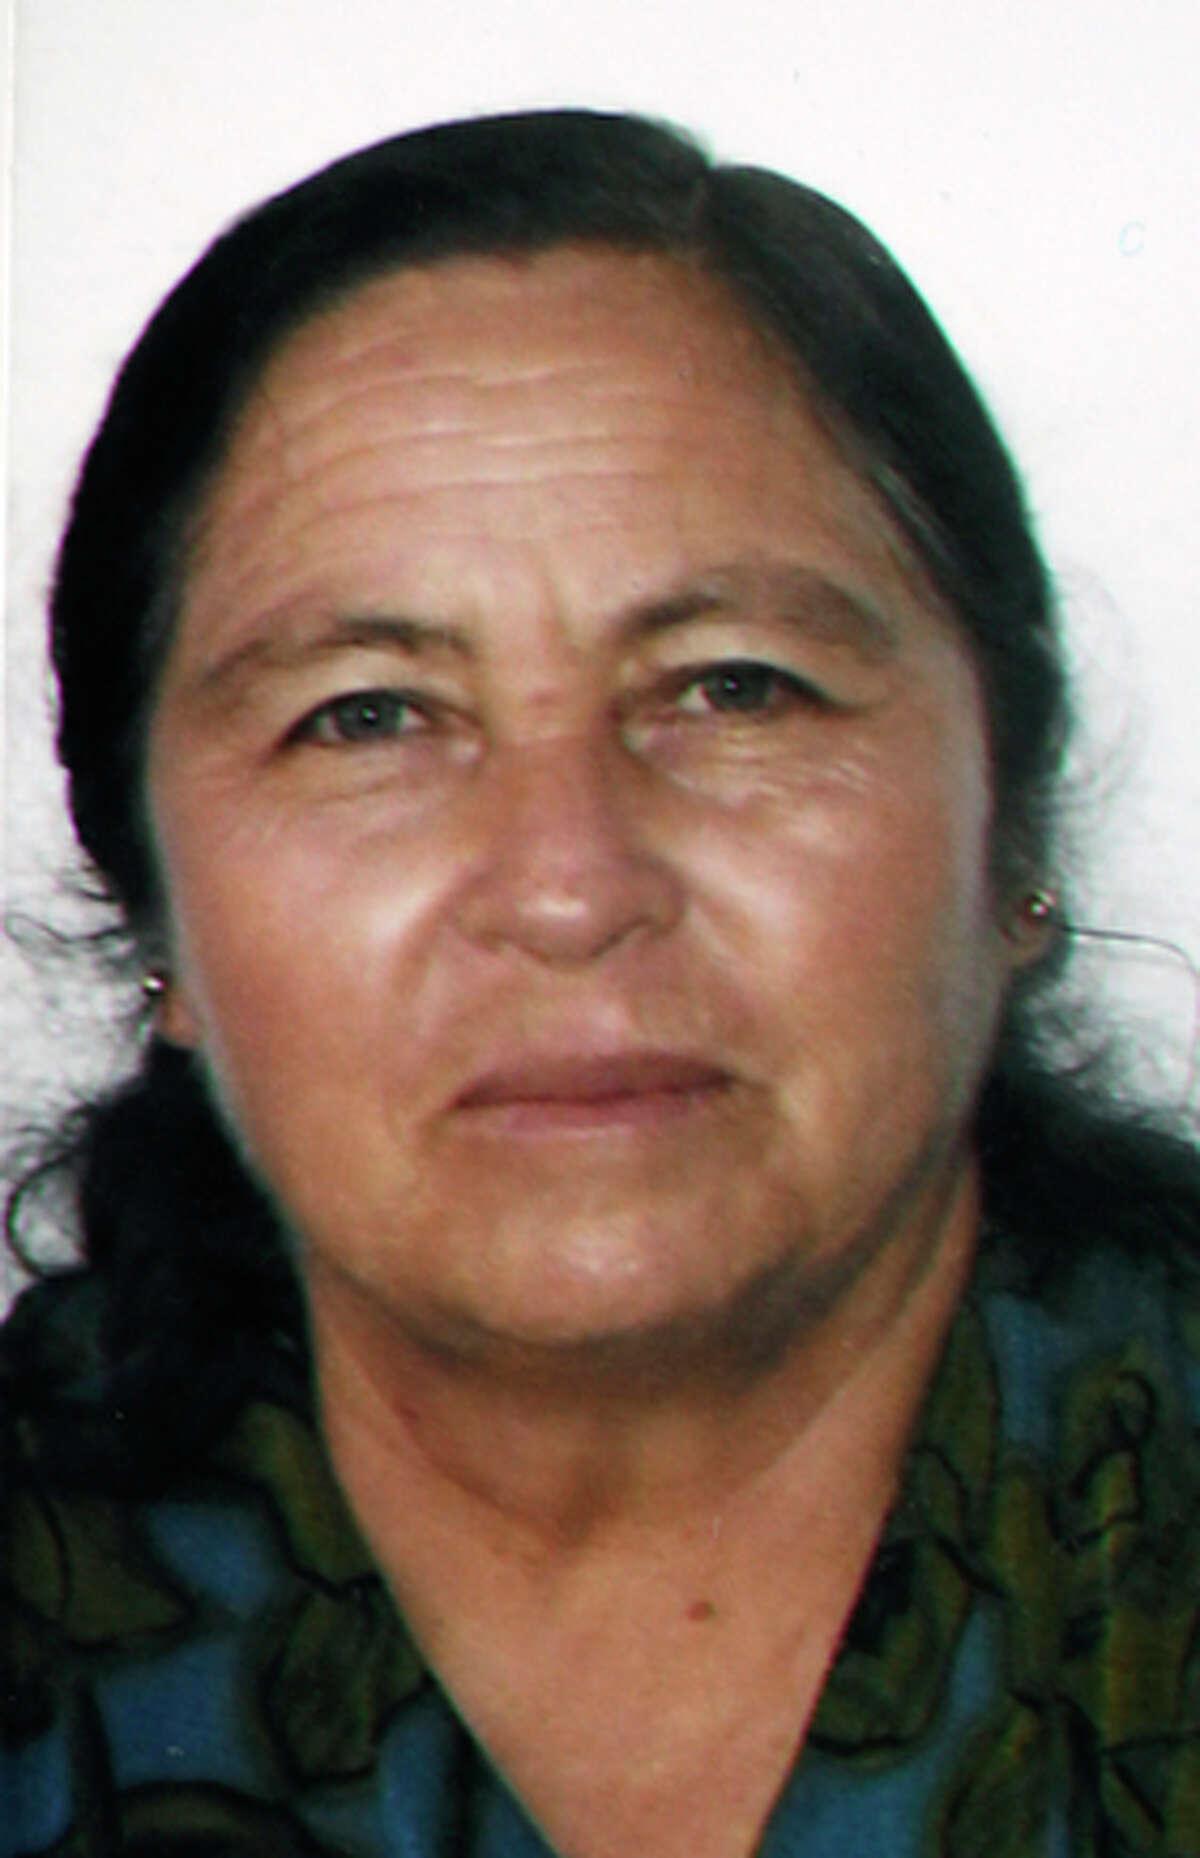 Maria Concepcion Aguilar de Perez, 55, was killed in the car accident.